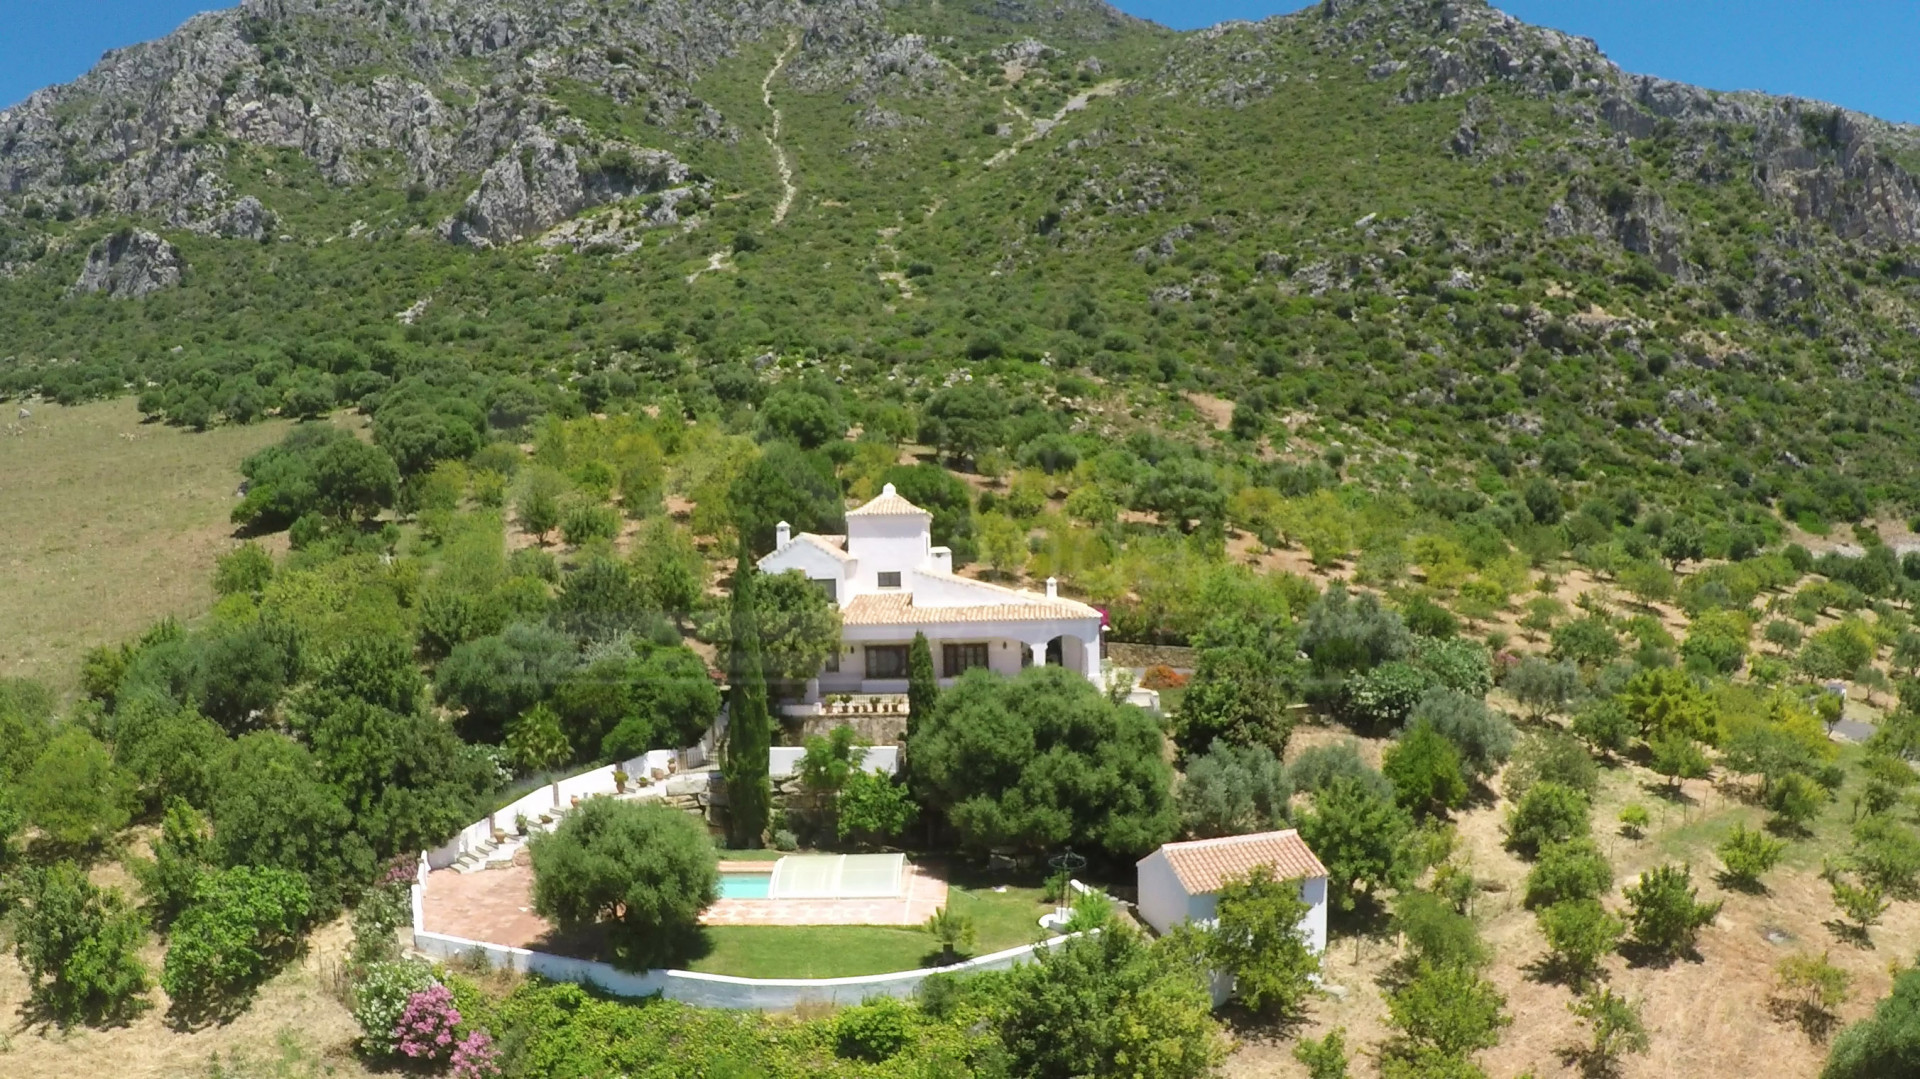 Charming 4 bedroom country villa in a dream location near Casares